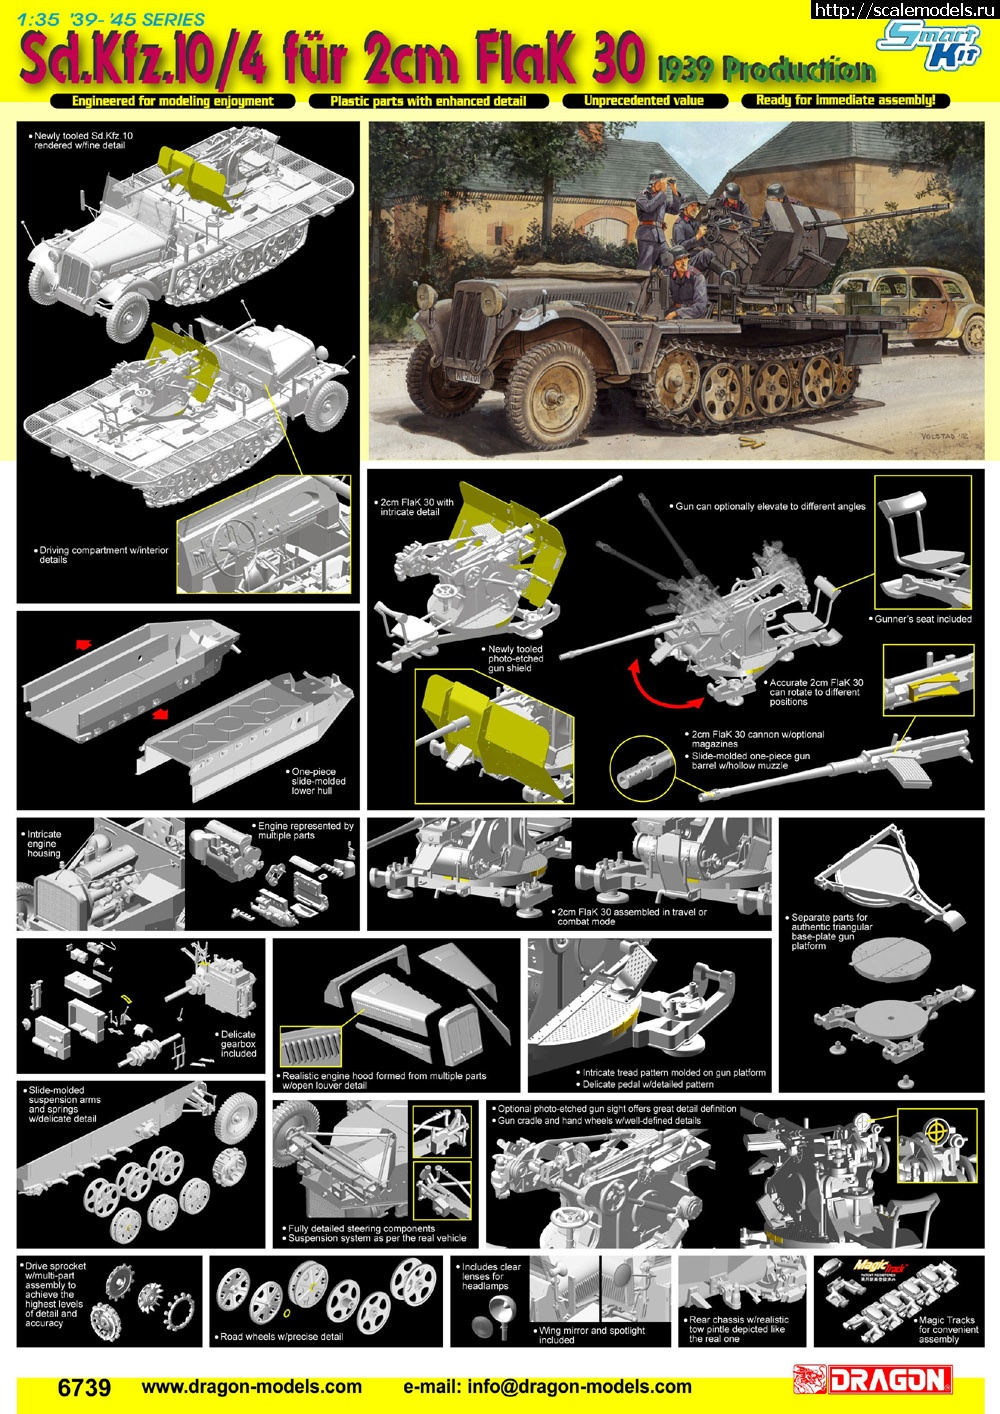 Новинка Dragon: 1/35 Sd.Kfz.10/4 fur 2cm FlaK 30 1939 Production  Закрыть окно